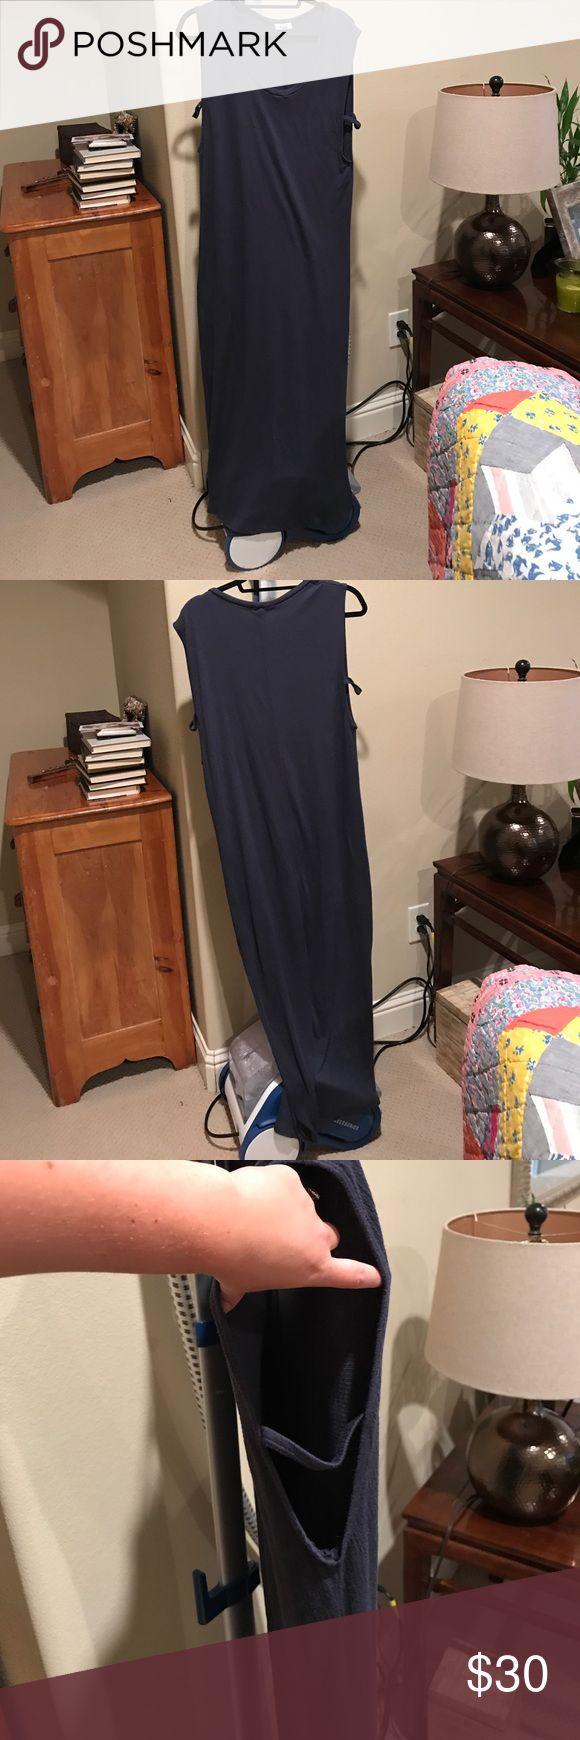 Navy maxi dress Navy maxi dress. From Nordstrom LNA Dresses Maxi